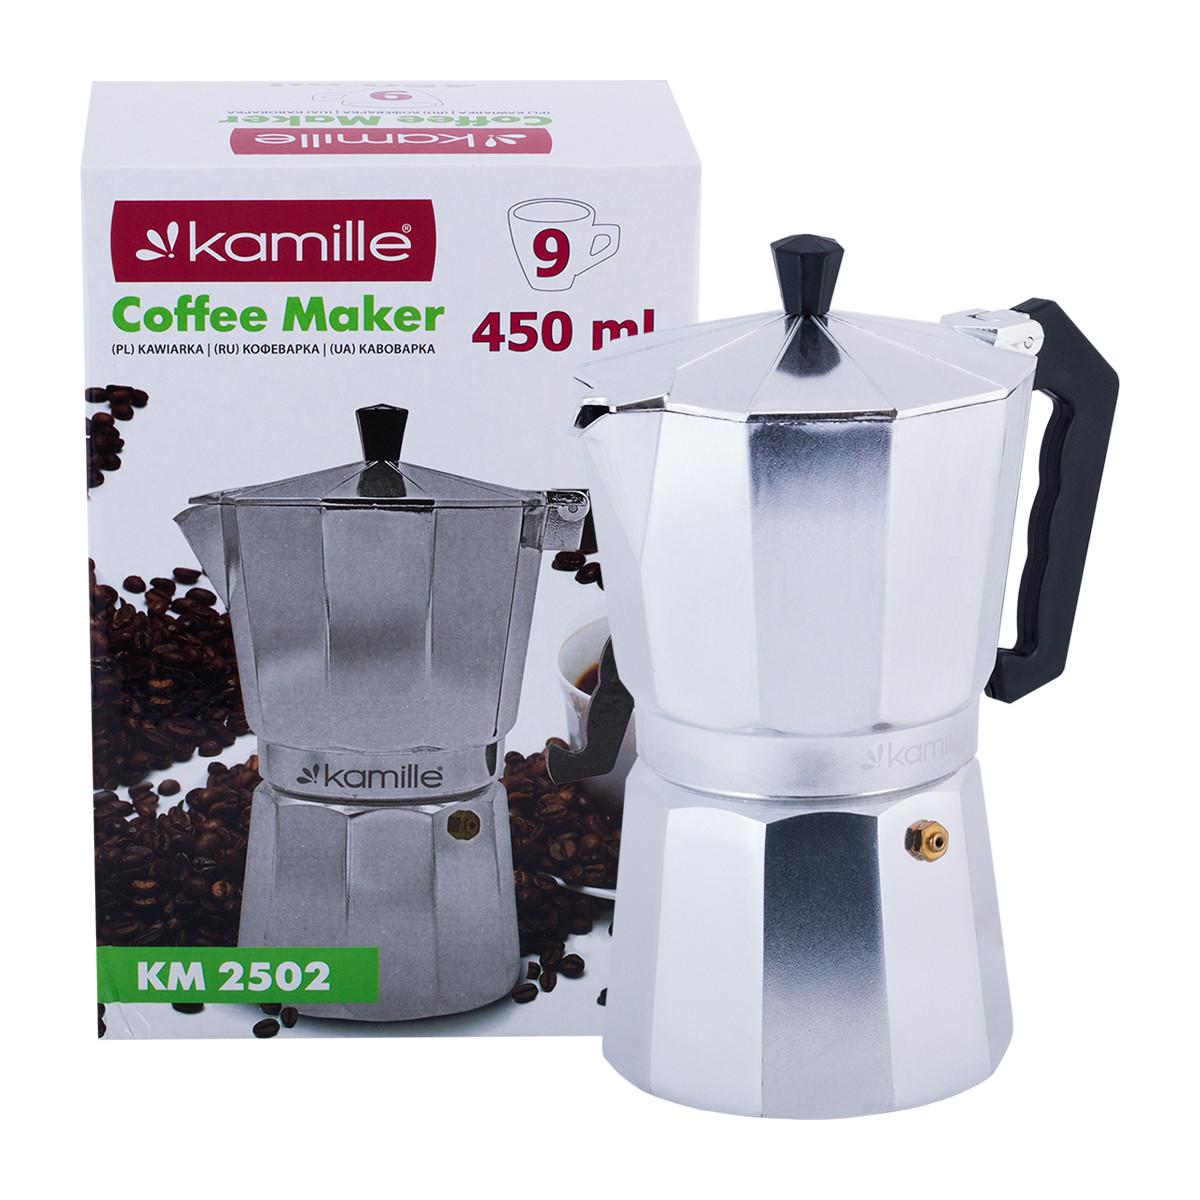 Кофеварка гейзерная Kamille 450мл из алюминия KM-2502